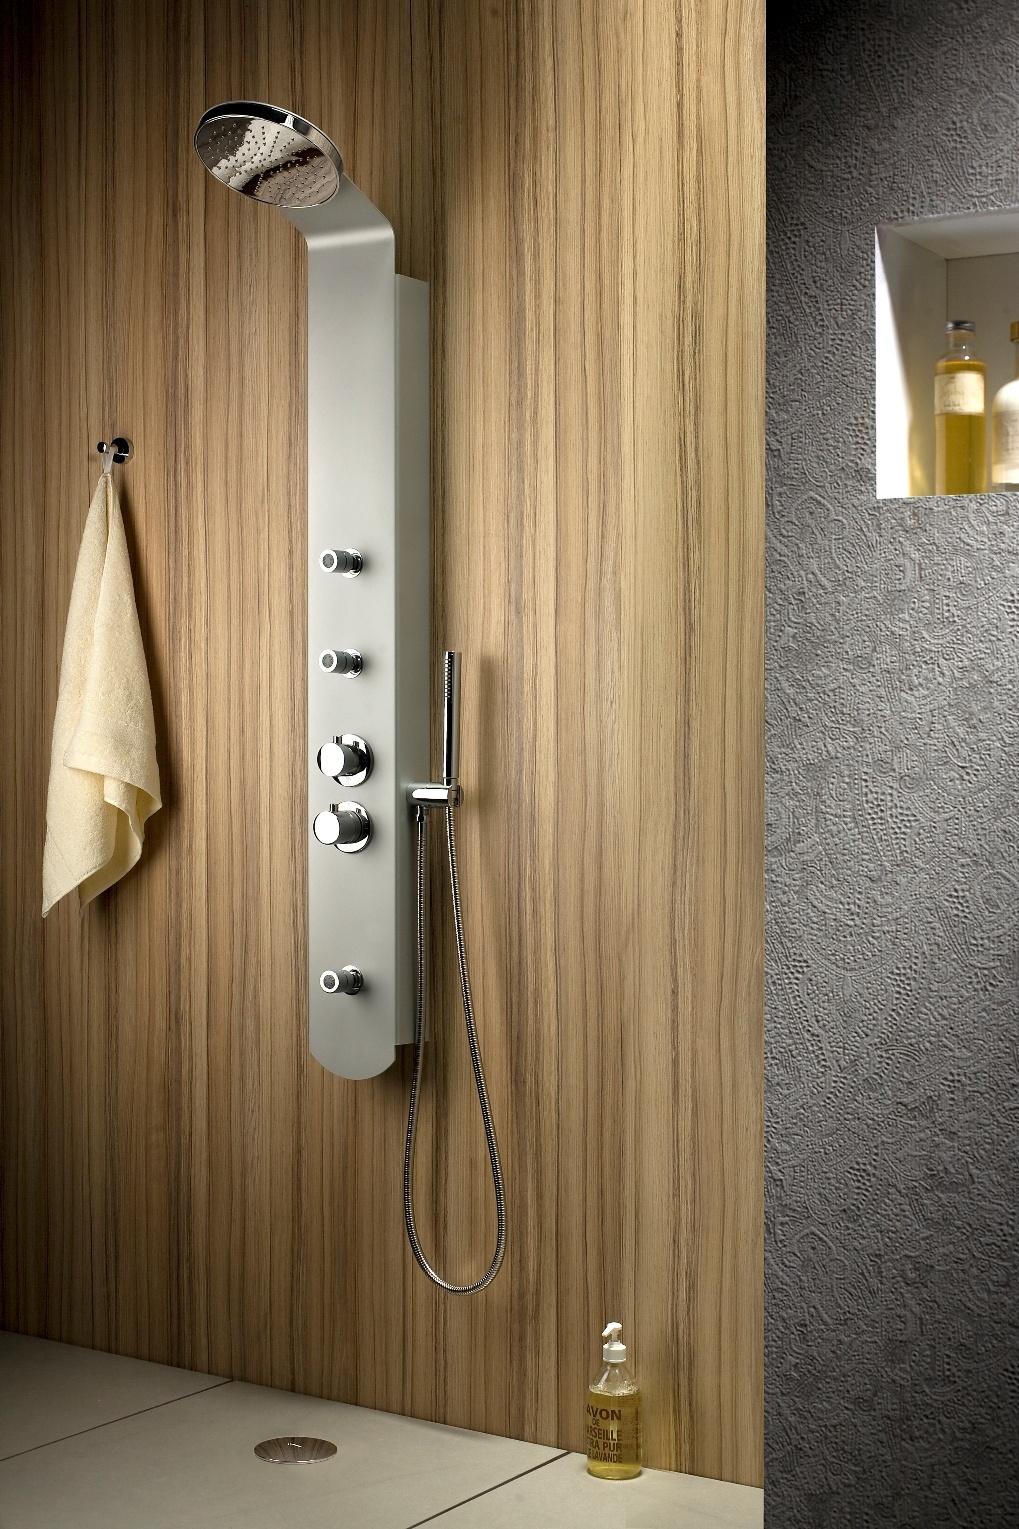 neuesbad duschpaneel unico kopfbrause 200 mm. Black Bedroom Furniture Sets. Home Design Ideas